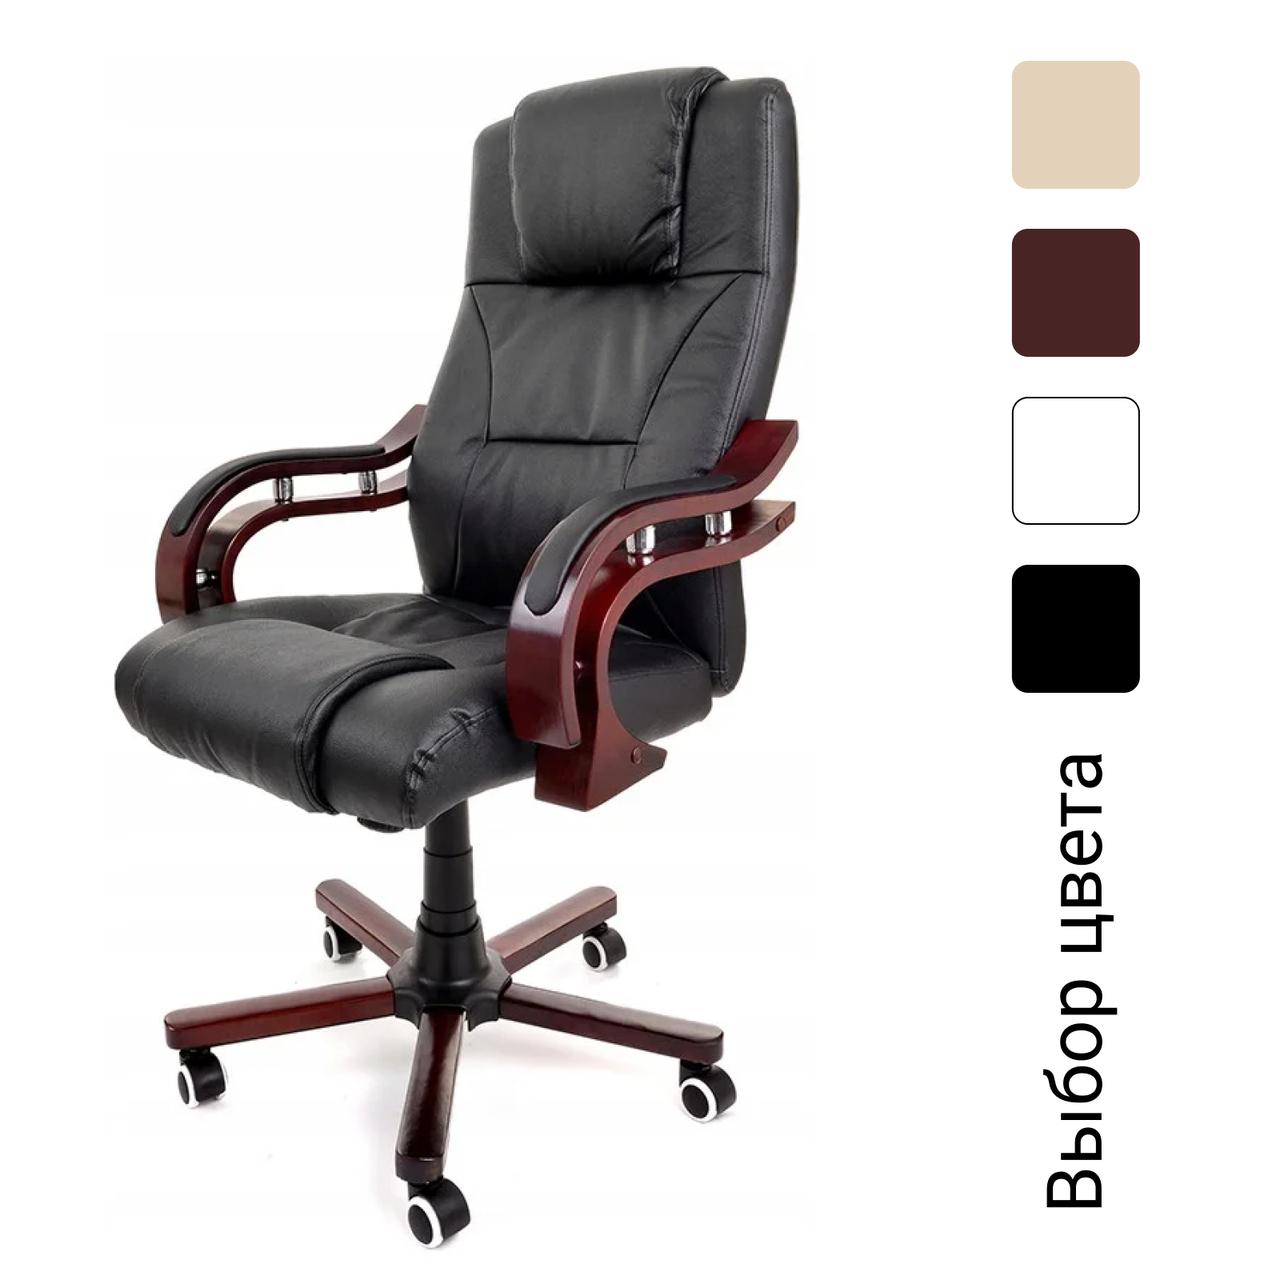 Комп'ютерне крісло офісне Prezydent Calviano механізм TILT Чорне